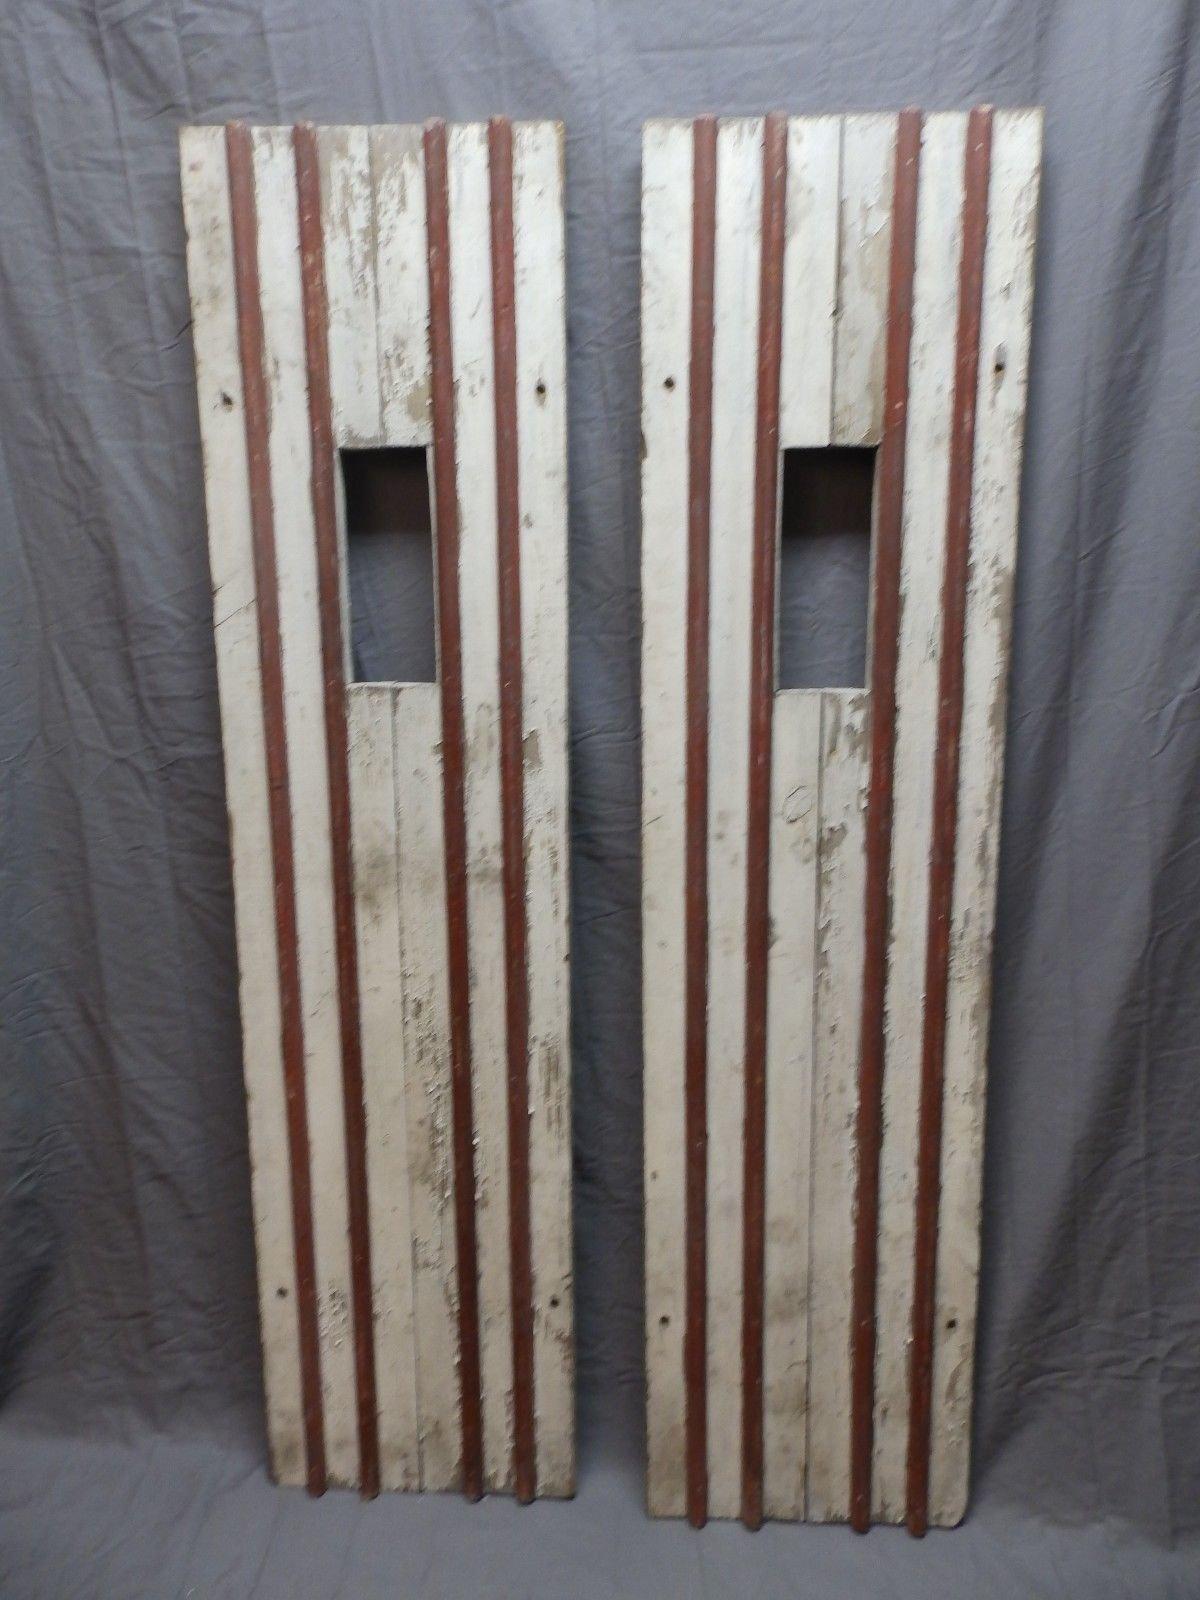 Details About Pair Antique House Window Wood Shutters 62x15 Adirondack Cabin Lodge Vtg 602 18p